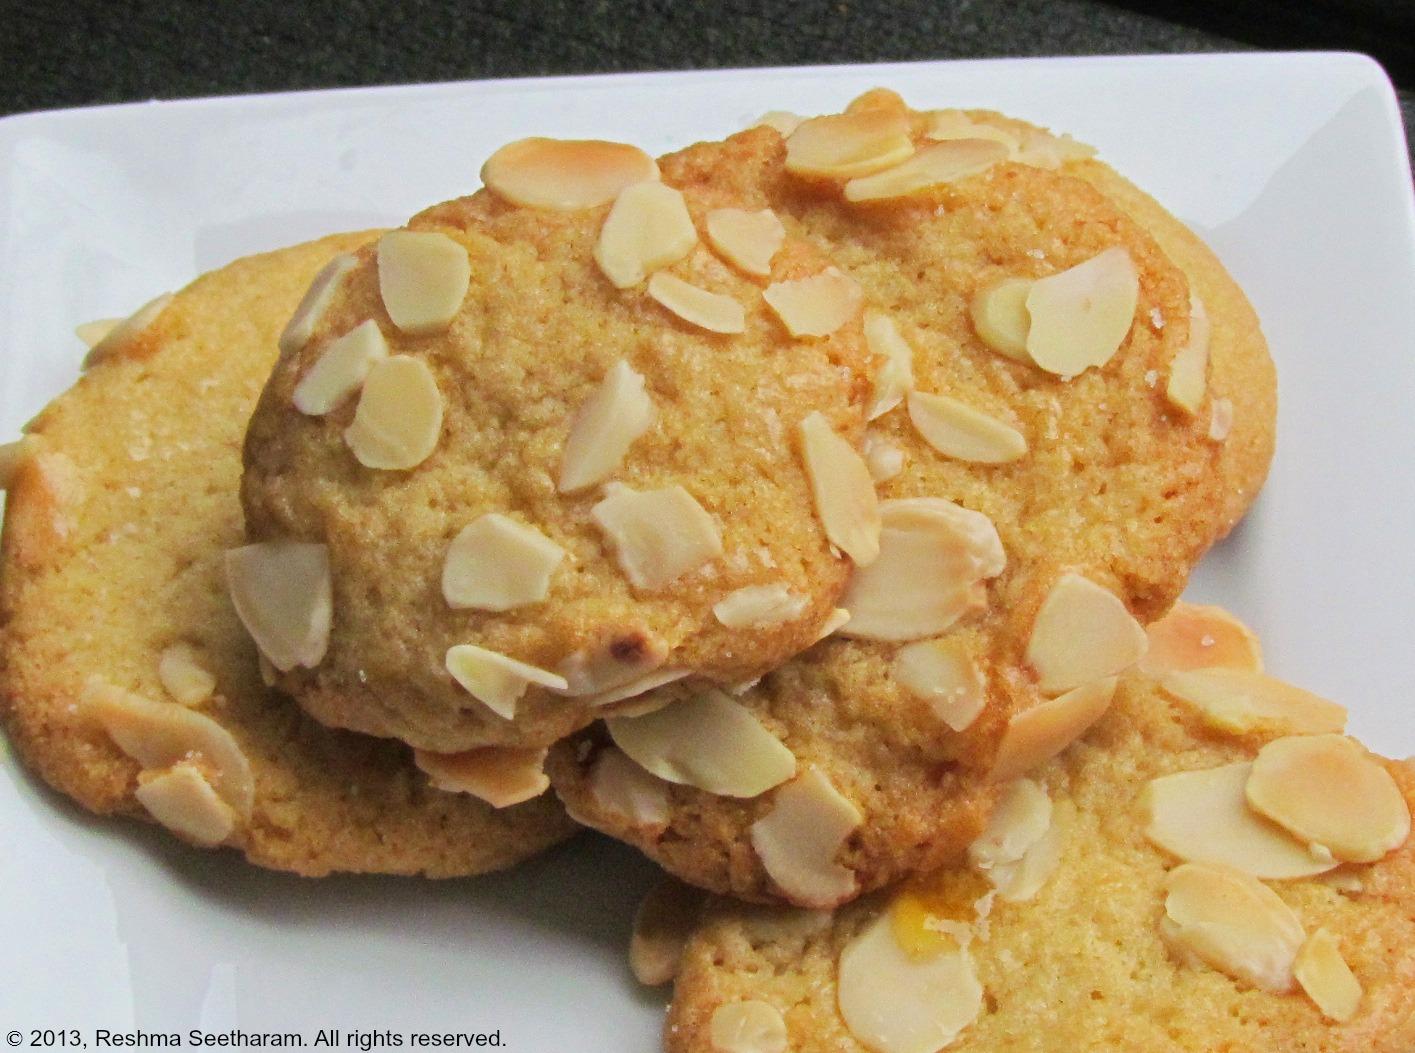 Myfoodarama.com: Almond coated cookies